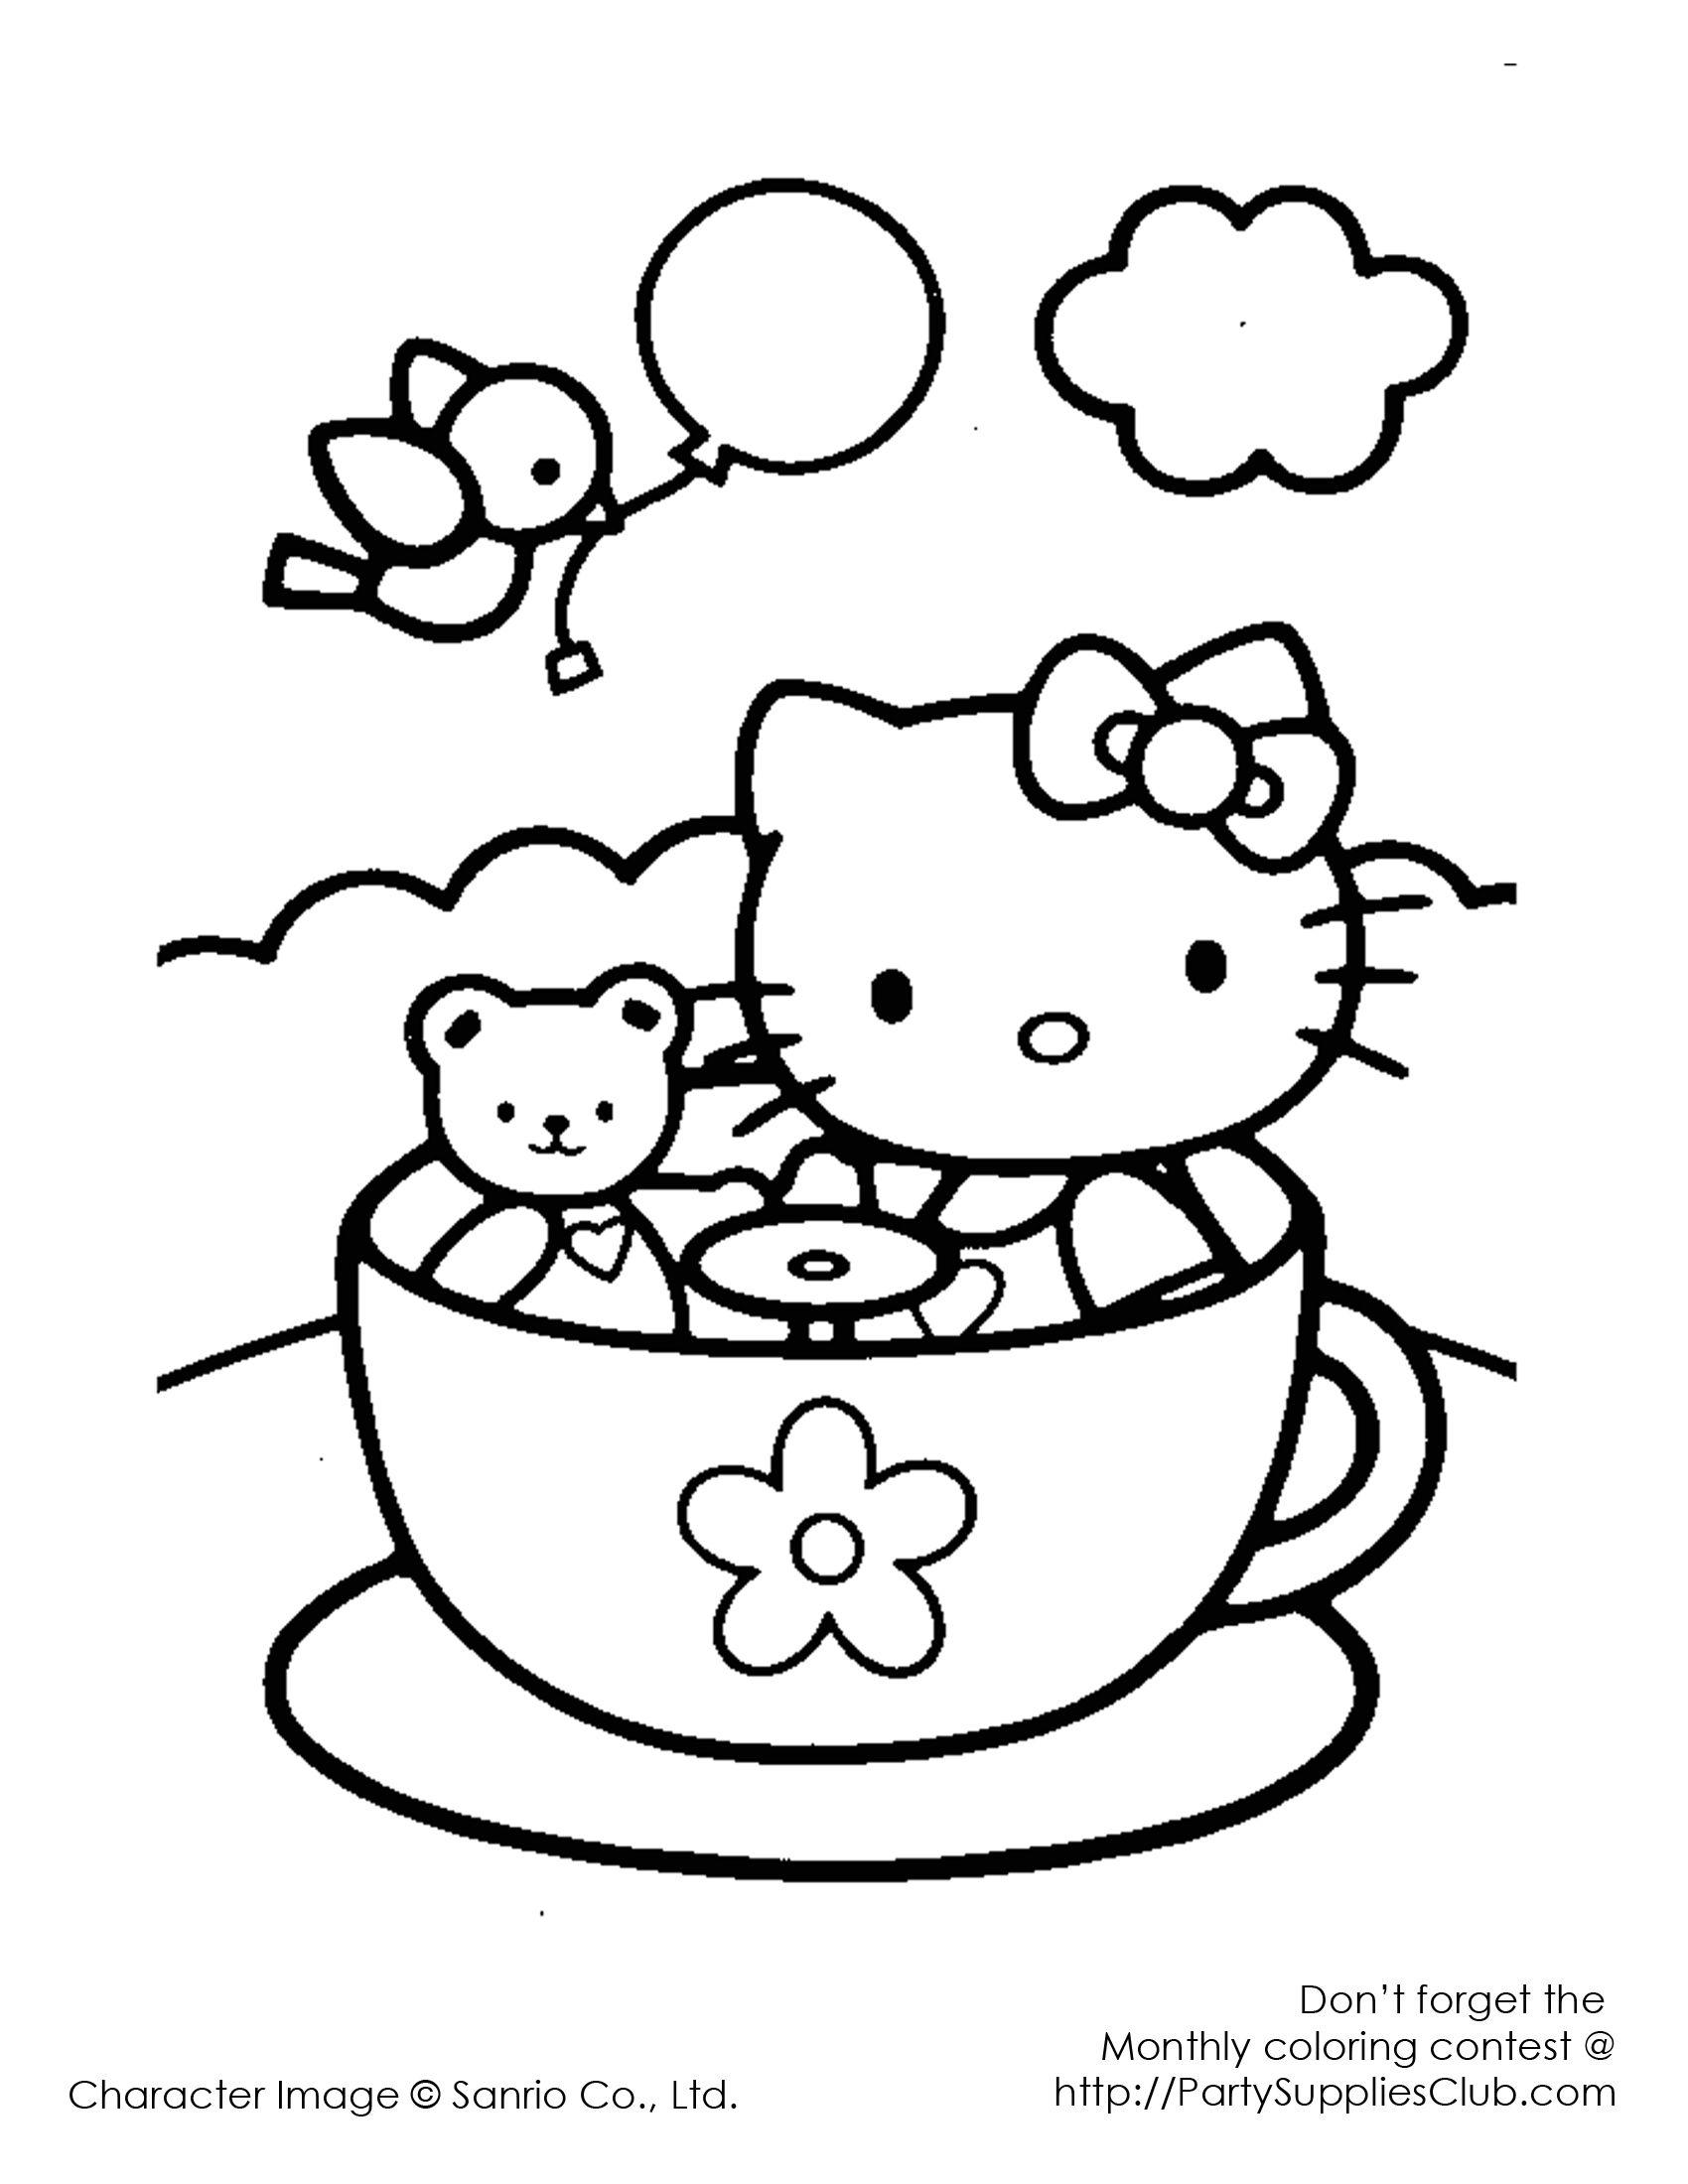 Osito Con Una Taza Para Colorear Busqueda De Google Hello Kitty Colouring Pages Hello Kitty Coloring Kitty Coloring